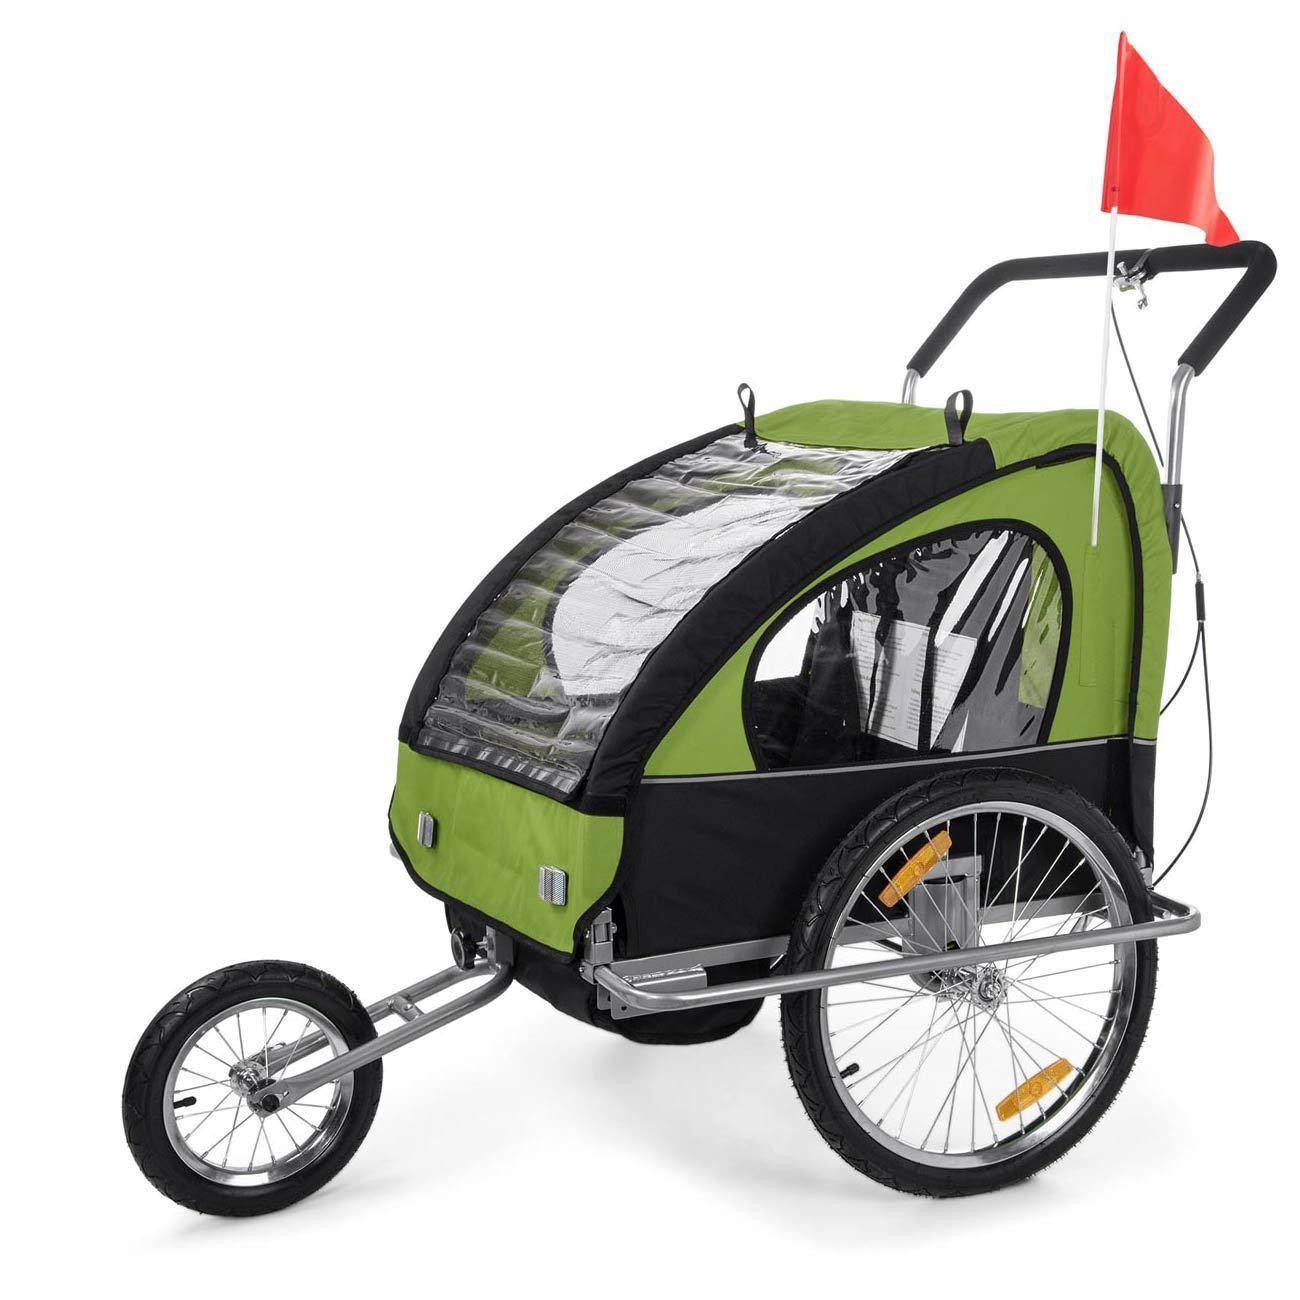 Jogger Fahrradanhänger Fahrradanhänger Jogger 2in1 Kinderanhänger Fahrrad Anhänger Transport SAMAX e21117